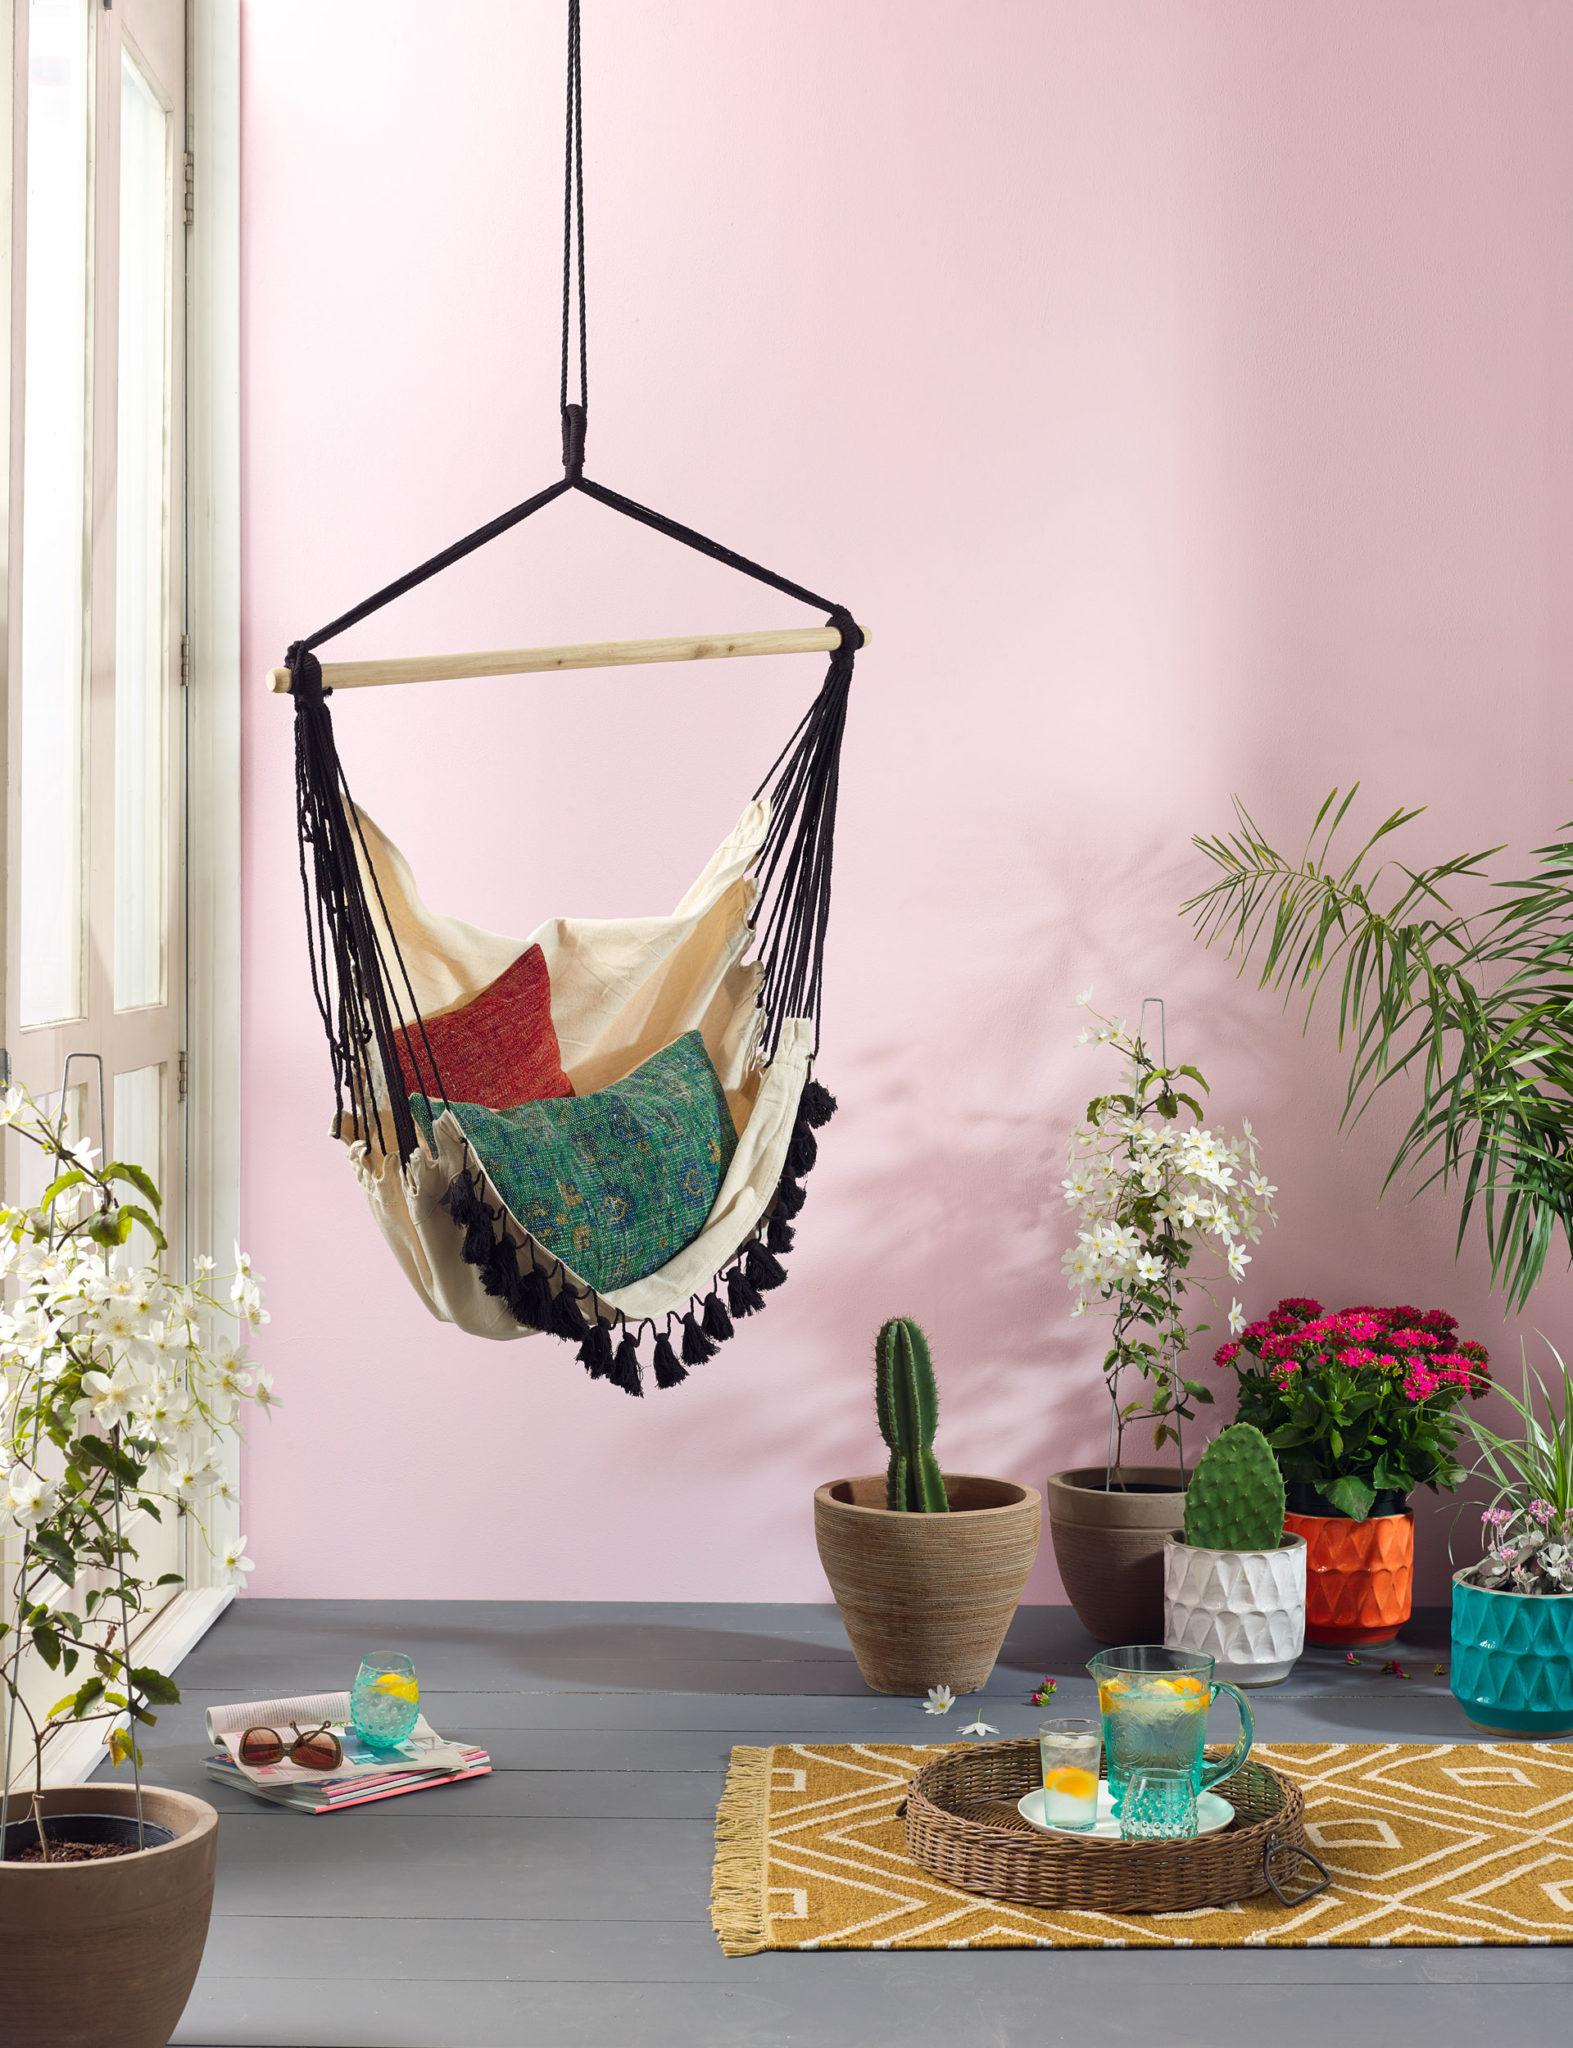 Bohemian-hammock-chair-in-a-pastel-room-